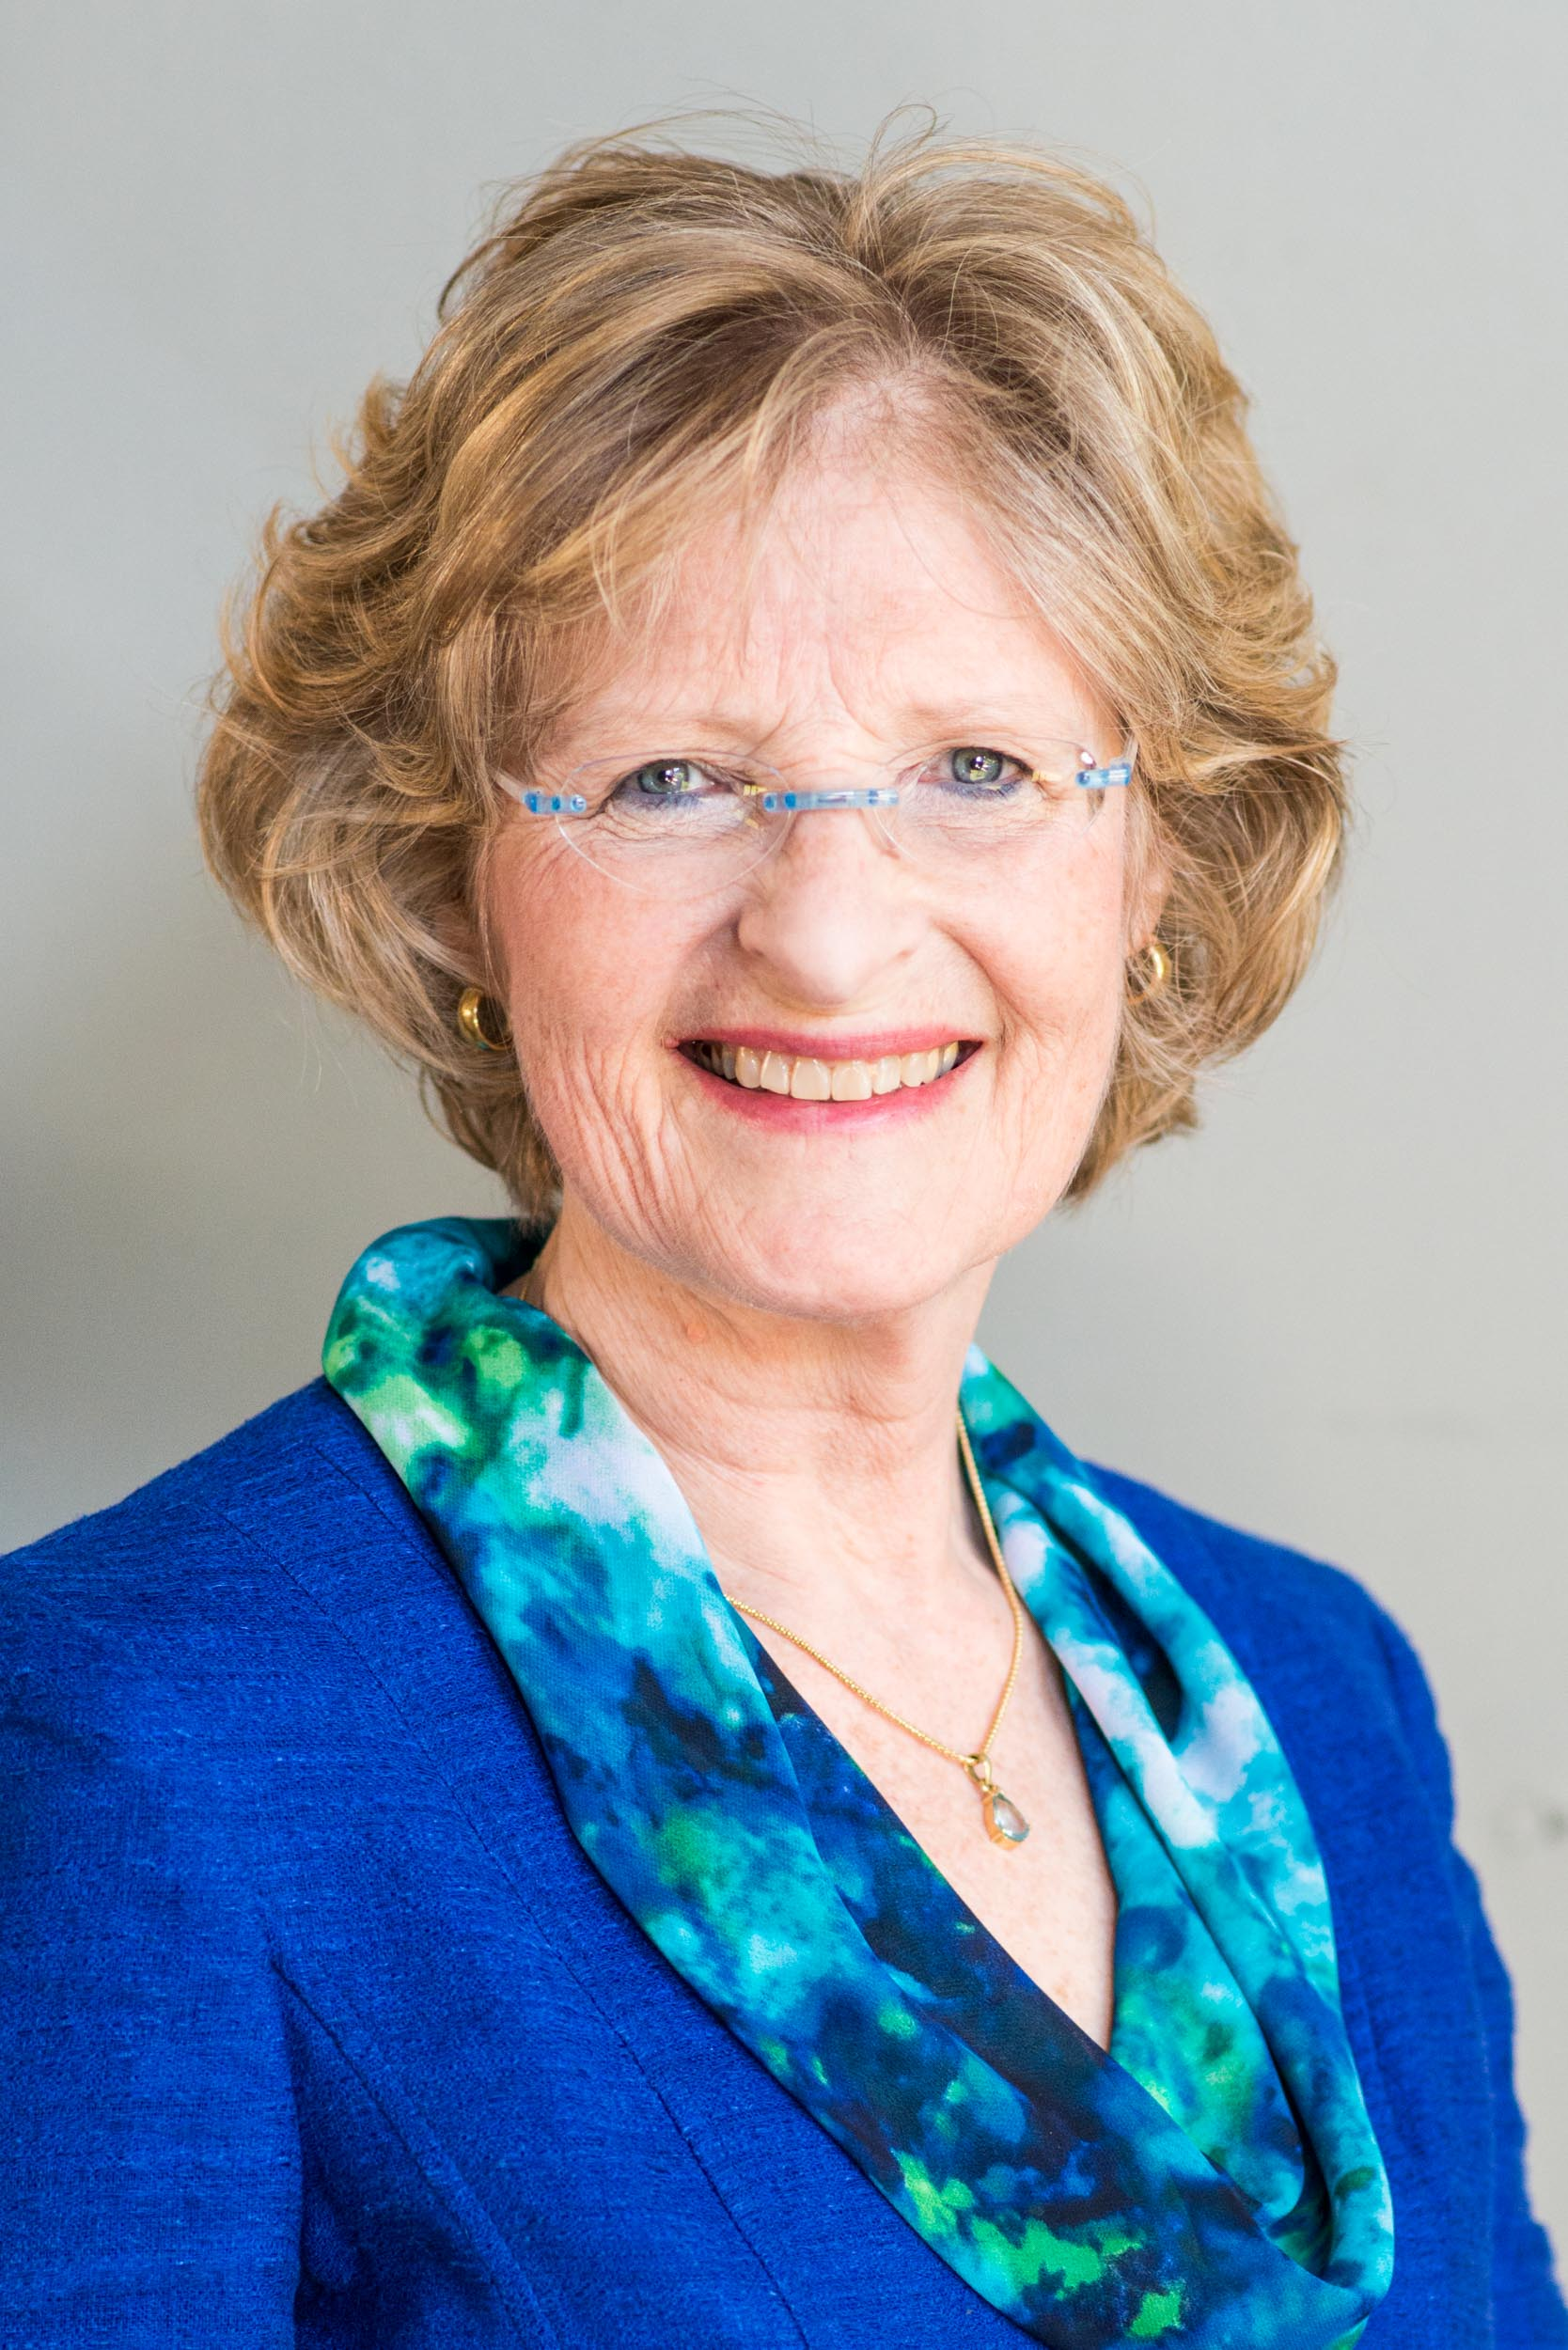 Older female headshot grey background - Worklife Portrait - Photo credit Nicola Bailey.jpg